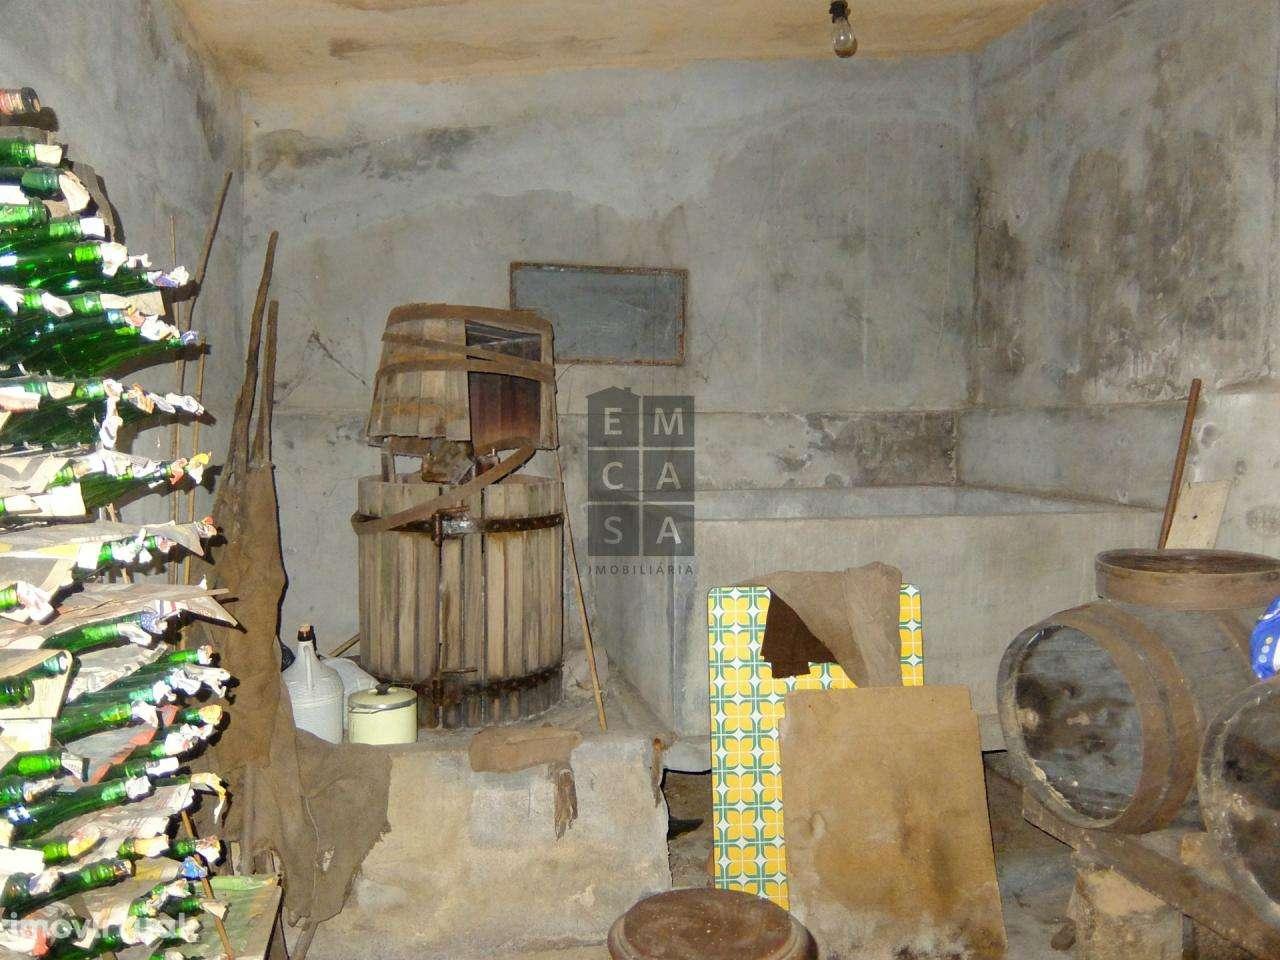 Moradia para comprar, Oliveira de Azeméis, Santiago de Riba-Ul, Ul, Macinhata da Seixa e Madail, Oliveira de Azeméis, Aveiro - Foto 15